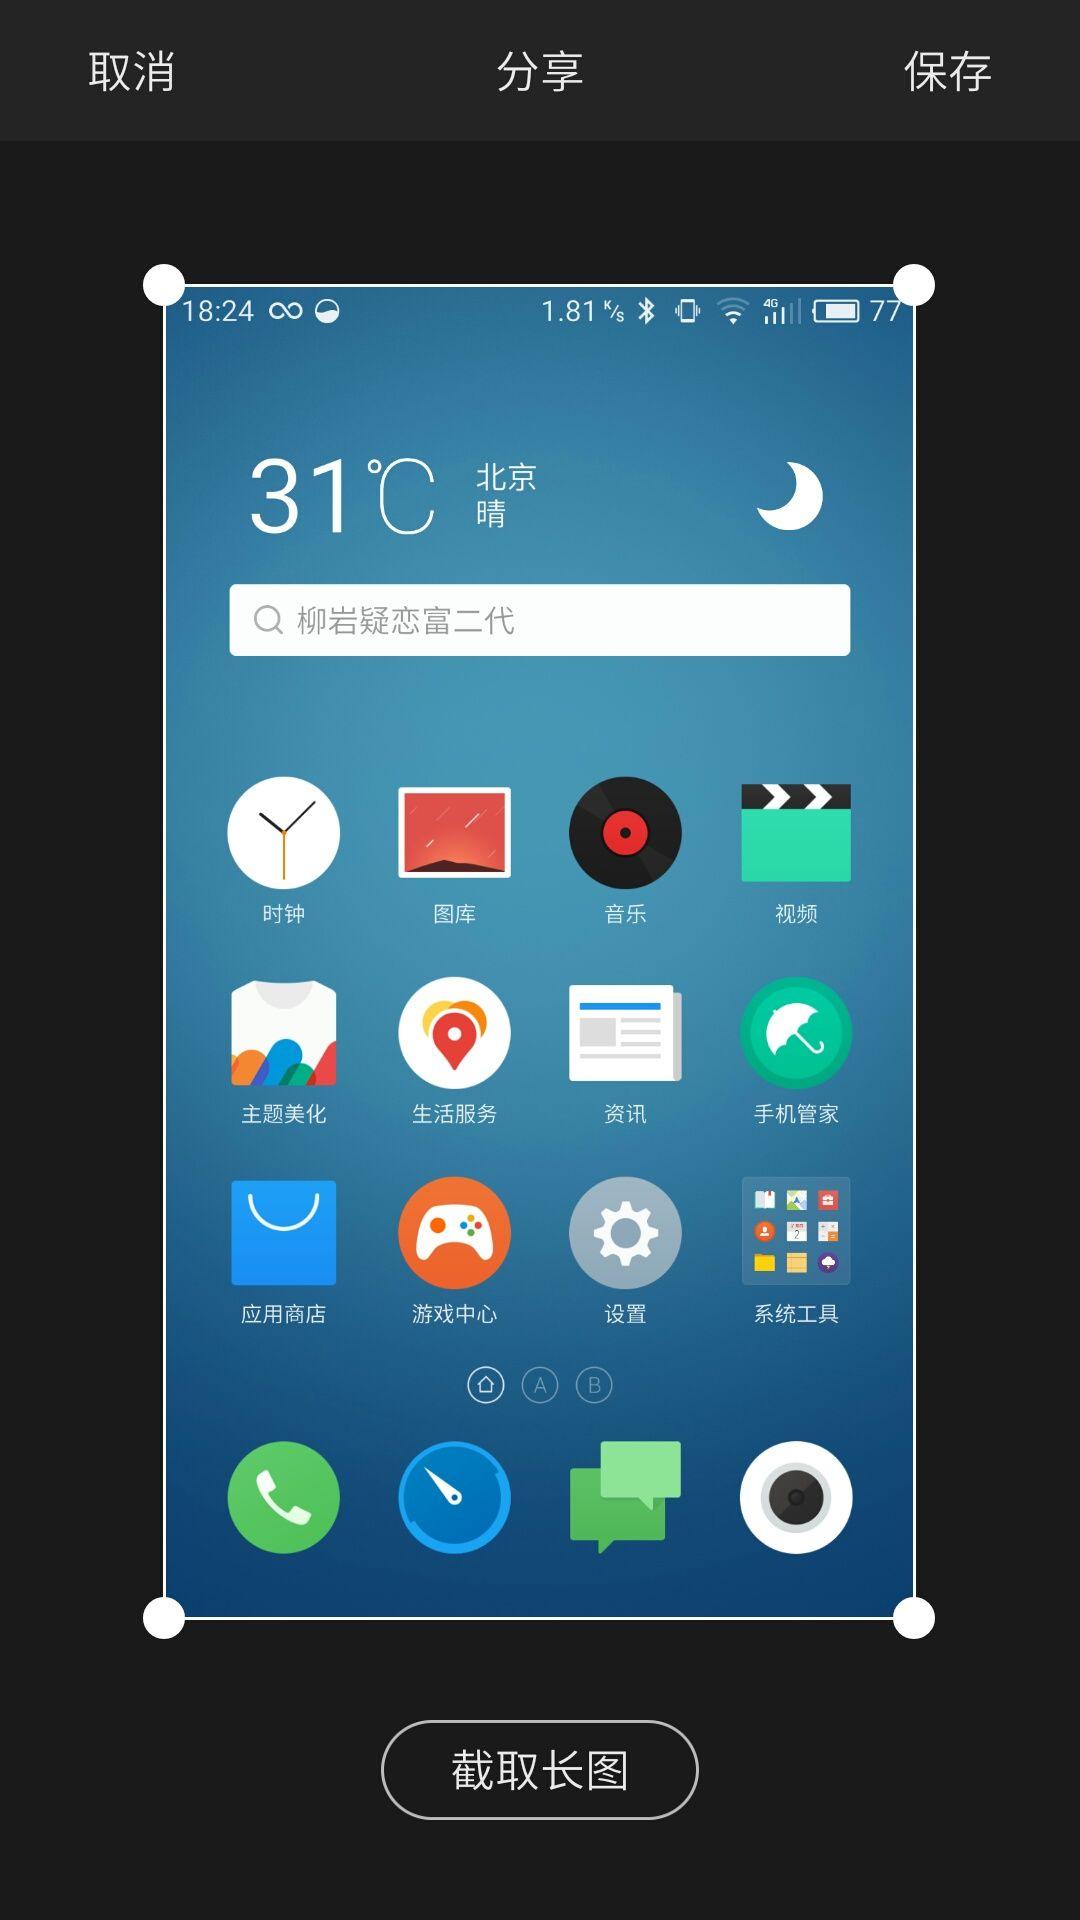 Flyme 5.6.6.2 dailyにてスクロールキャプチャーが可能に。他社製スマートフォンの機能を追随する形に